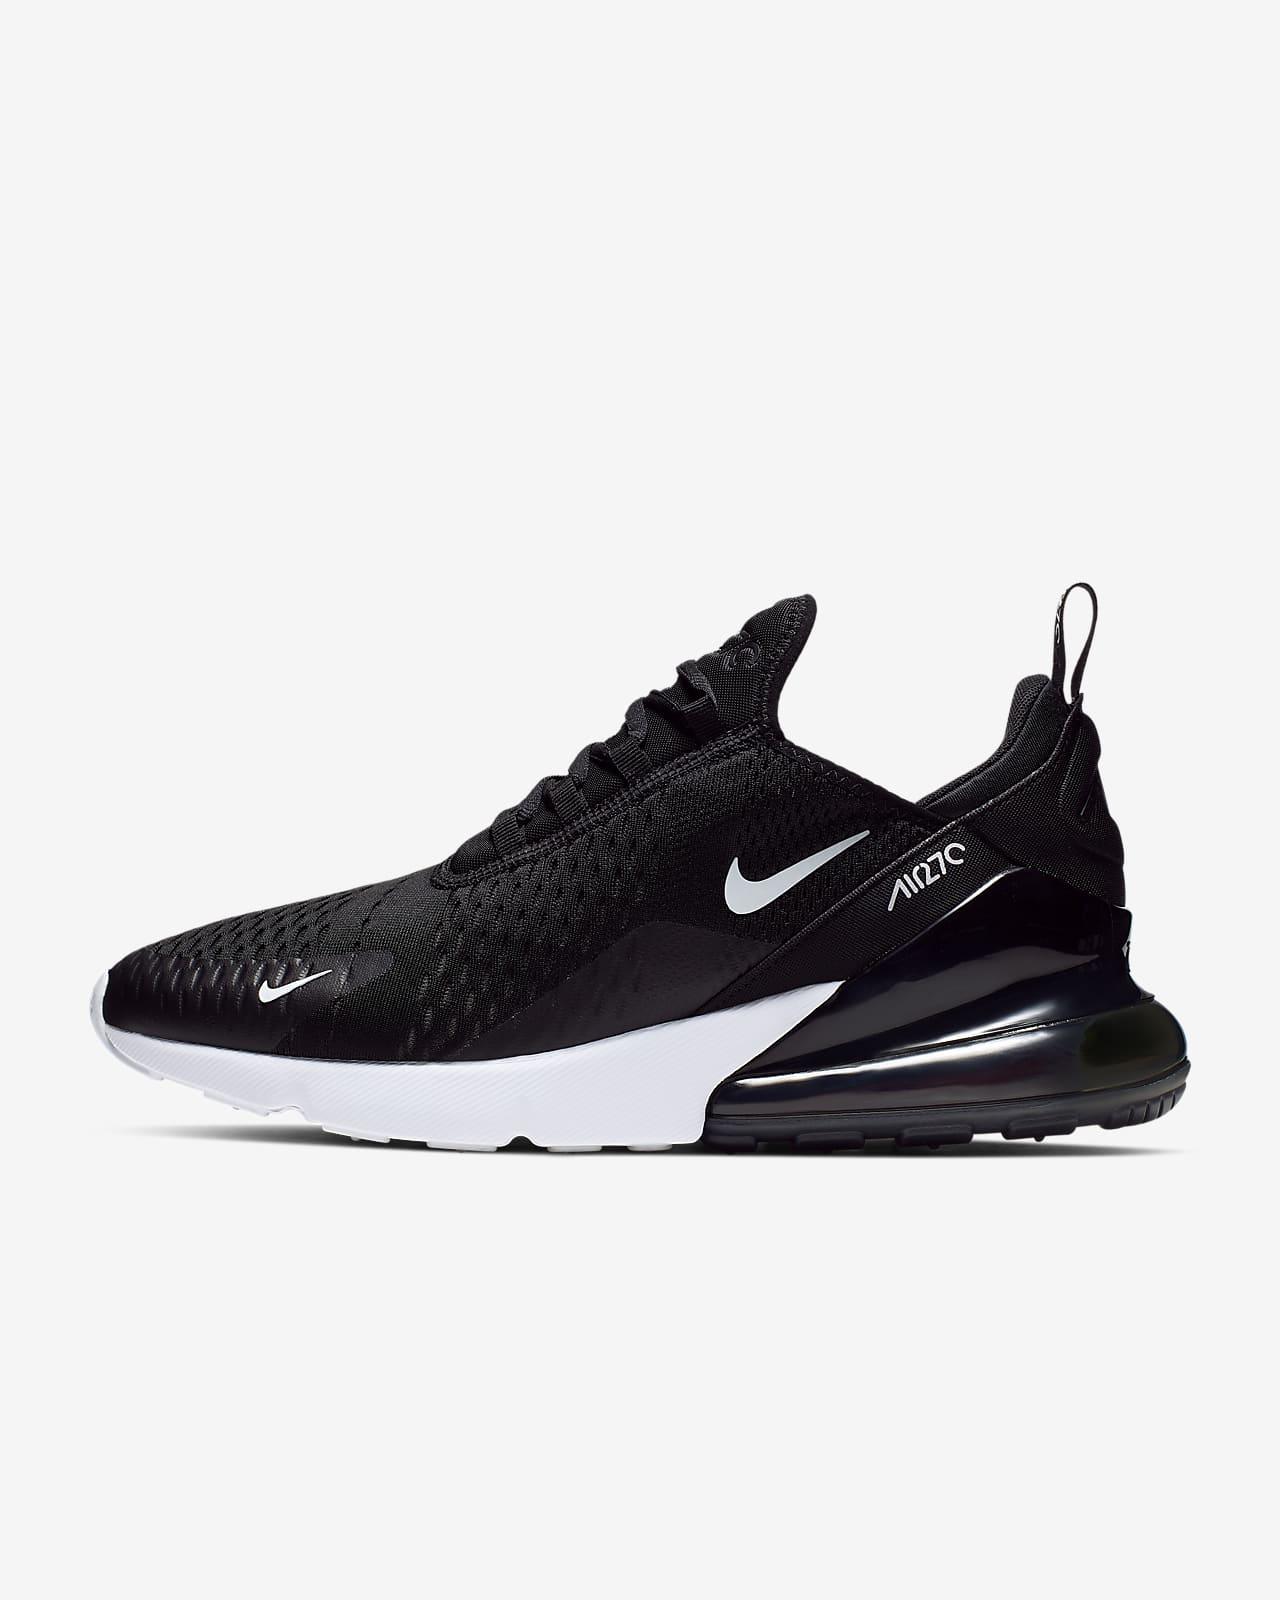 Nike Air Max 270 男子运动鞋